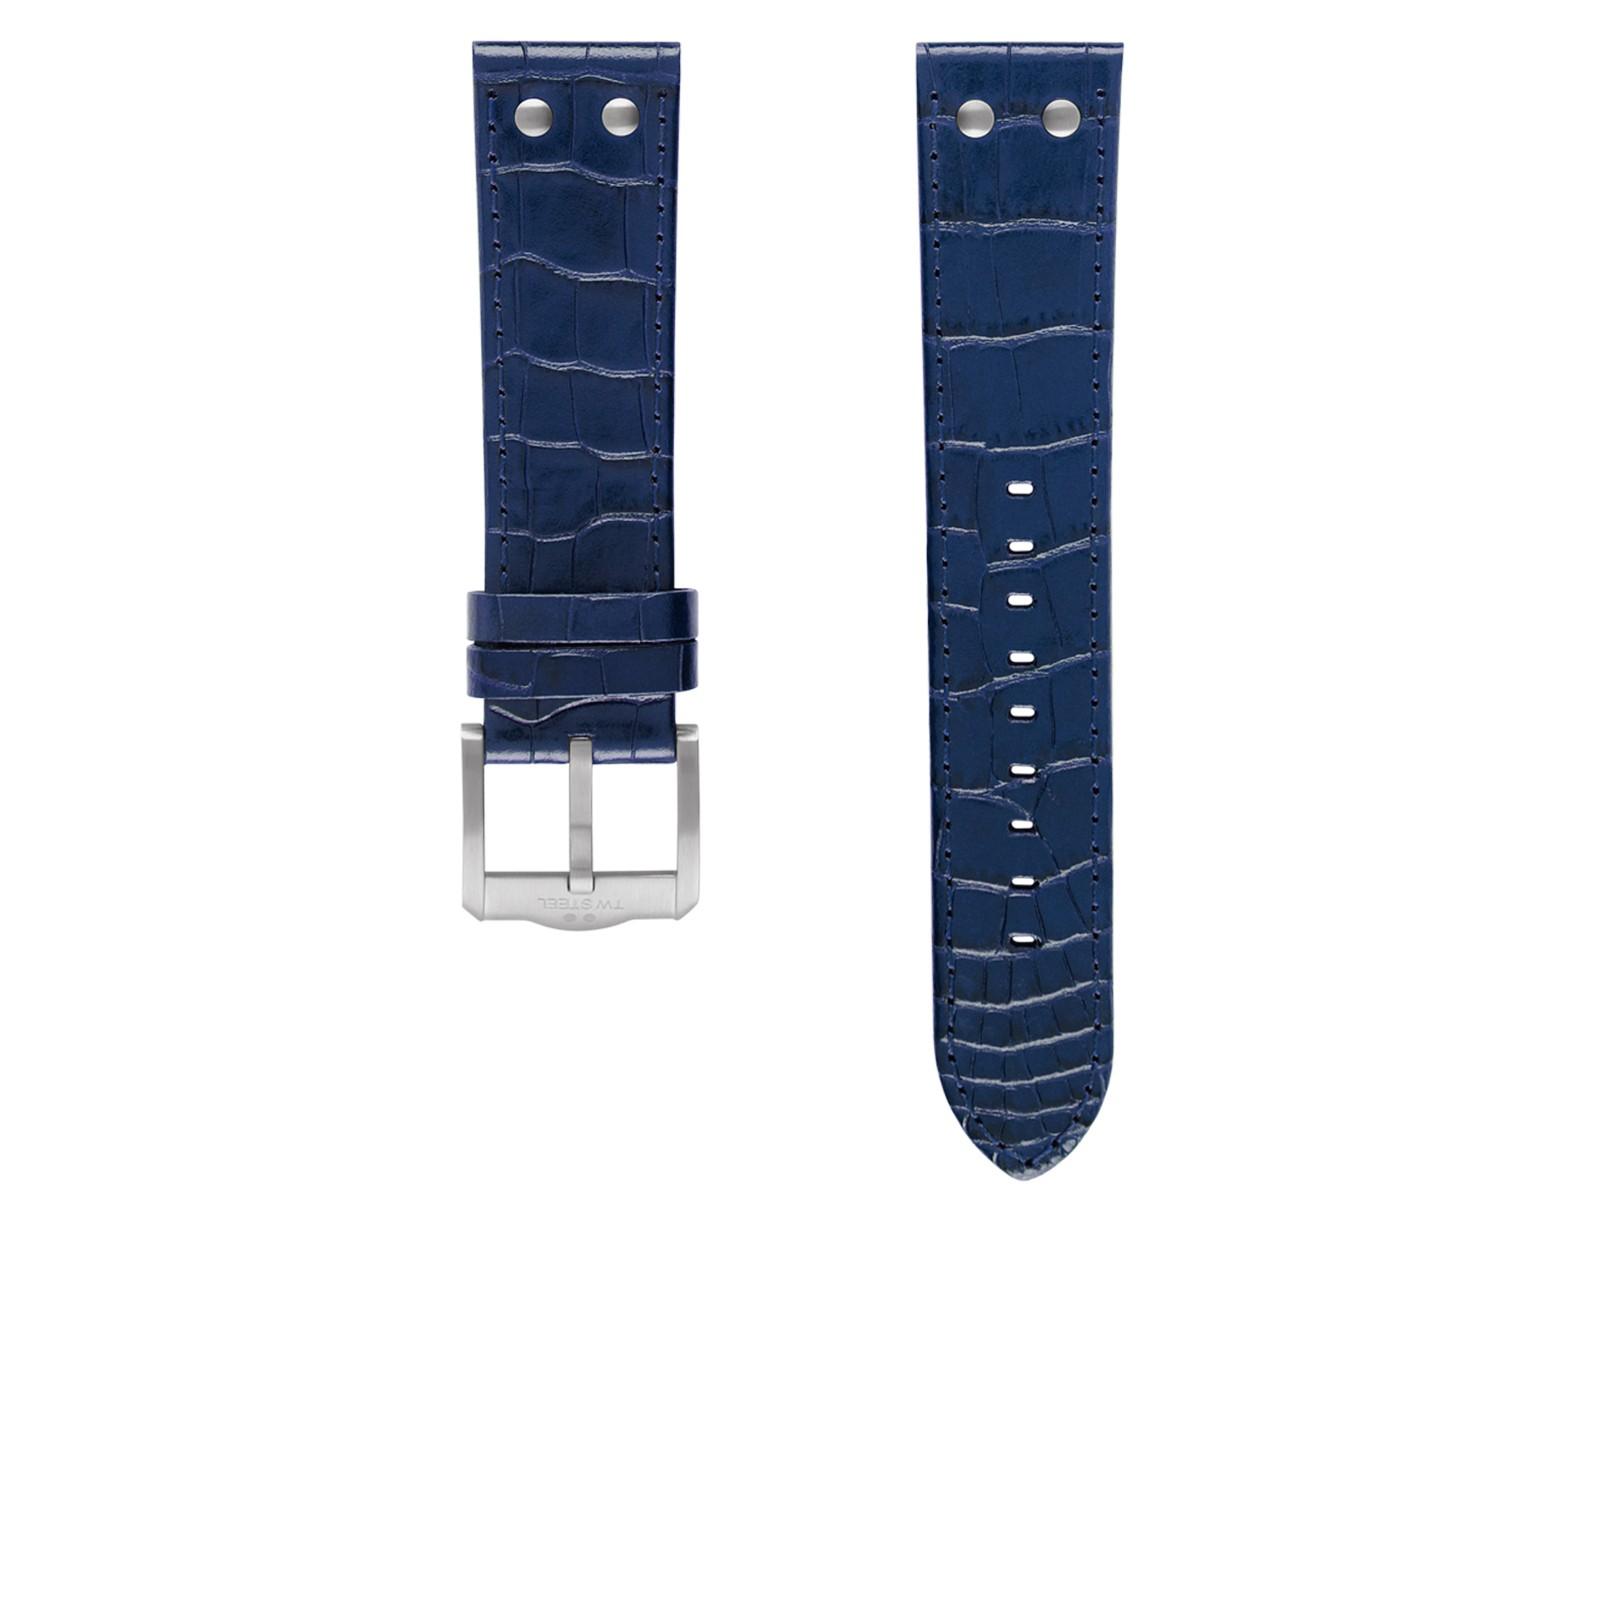 TW Steel horlogeband TWB1302 / TW1302 Leder Blauw 22mm + blauw stiksel